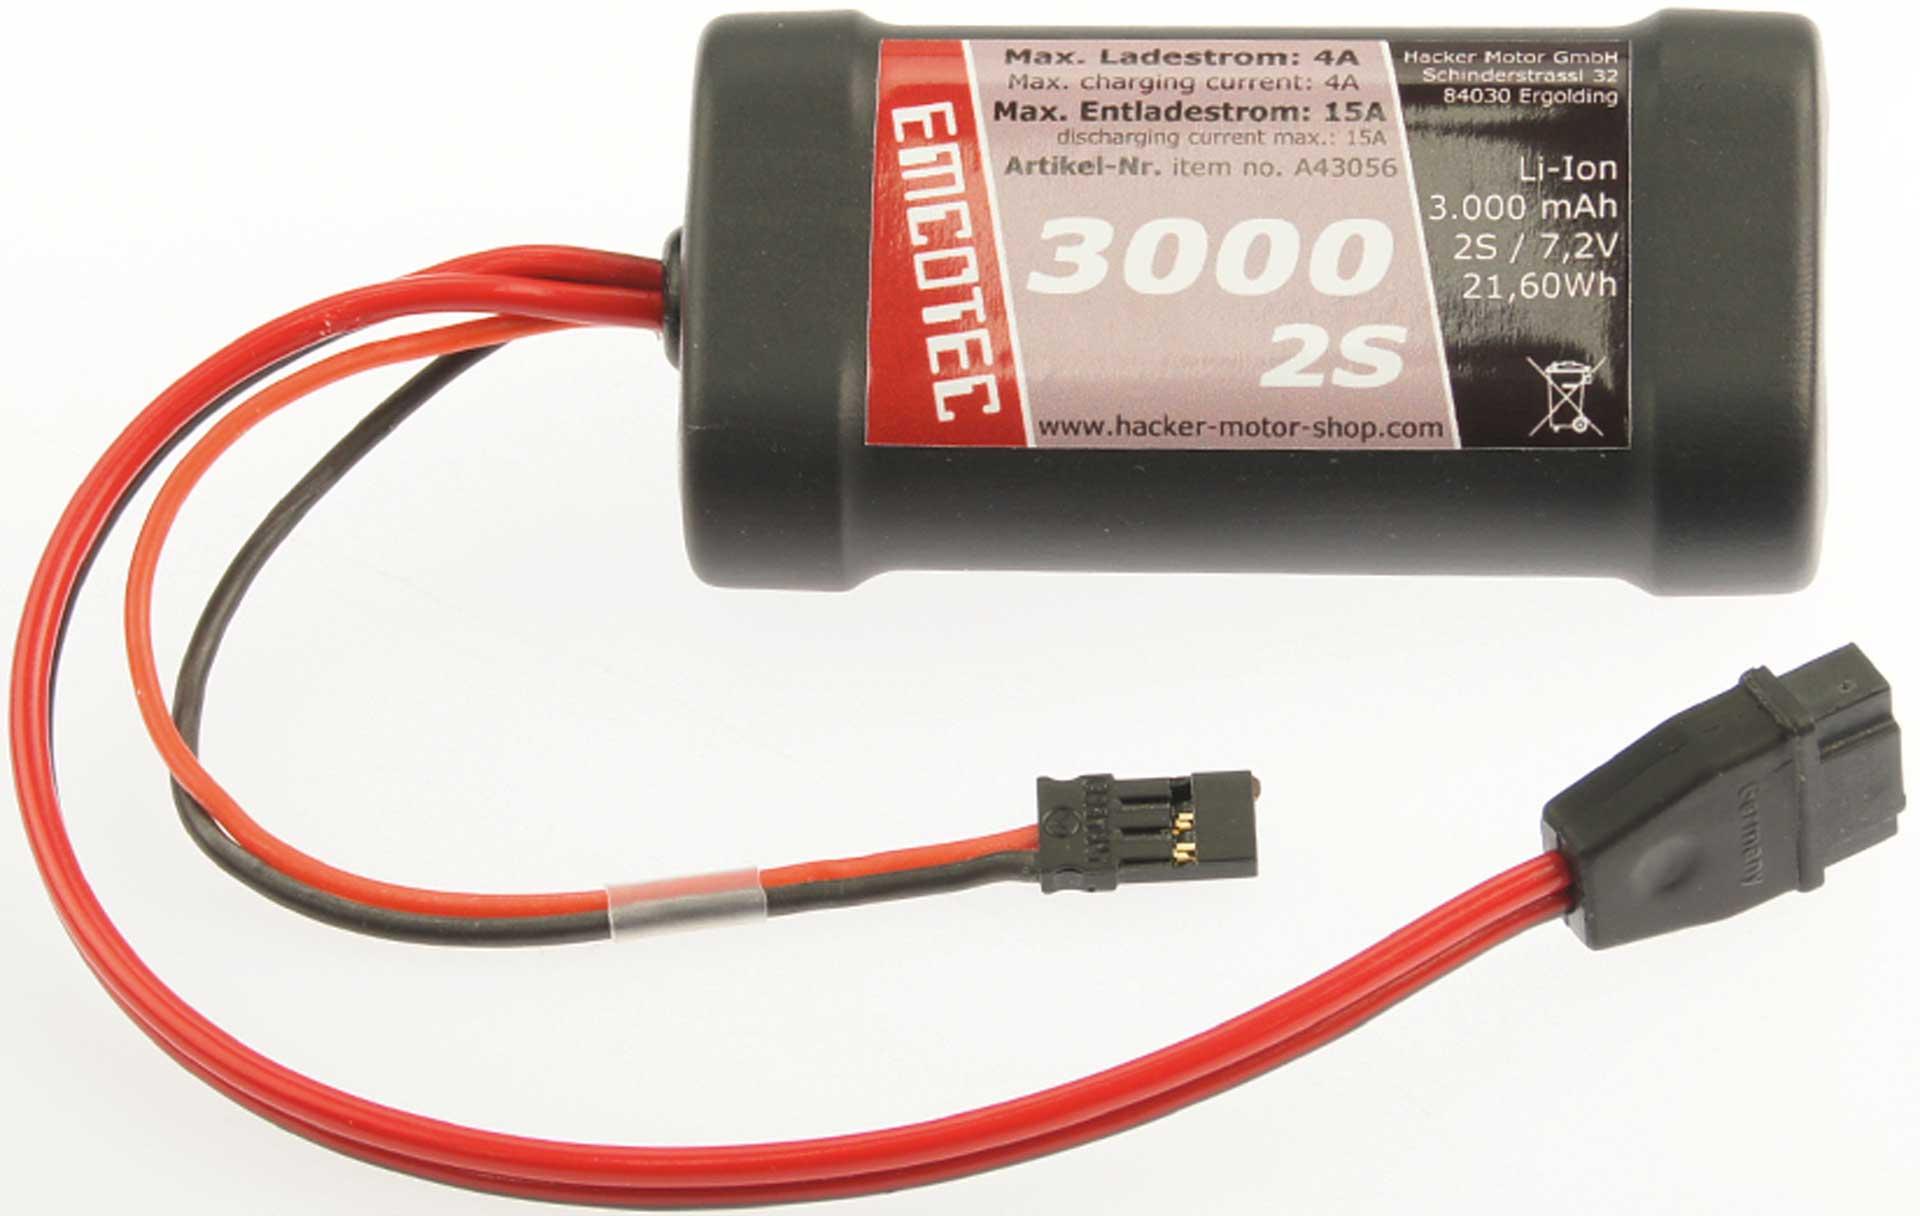 Emcotec LiIon-Akku 3000mAh 7,2V 2S Compact 15A